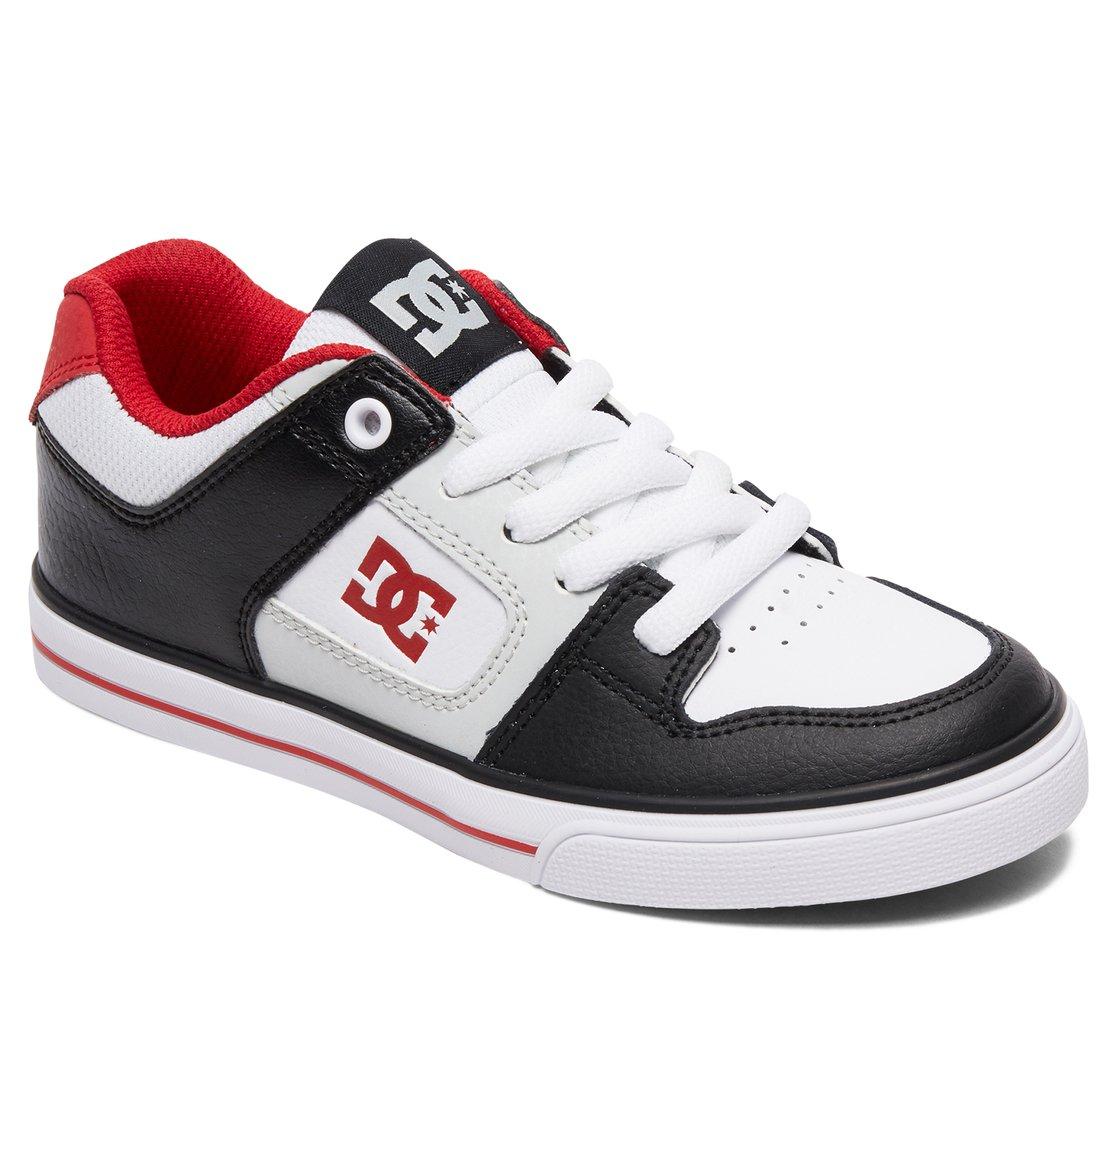 51e0b59dc DC-Shoes-Pure-Zapatillas-para-Ninos-ADBS300267 miniatura 6